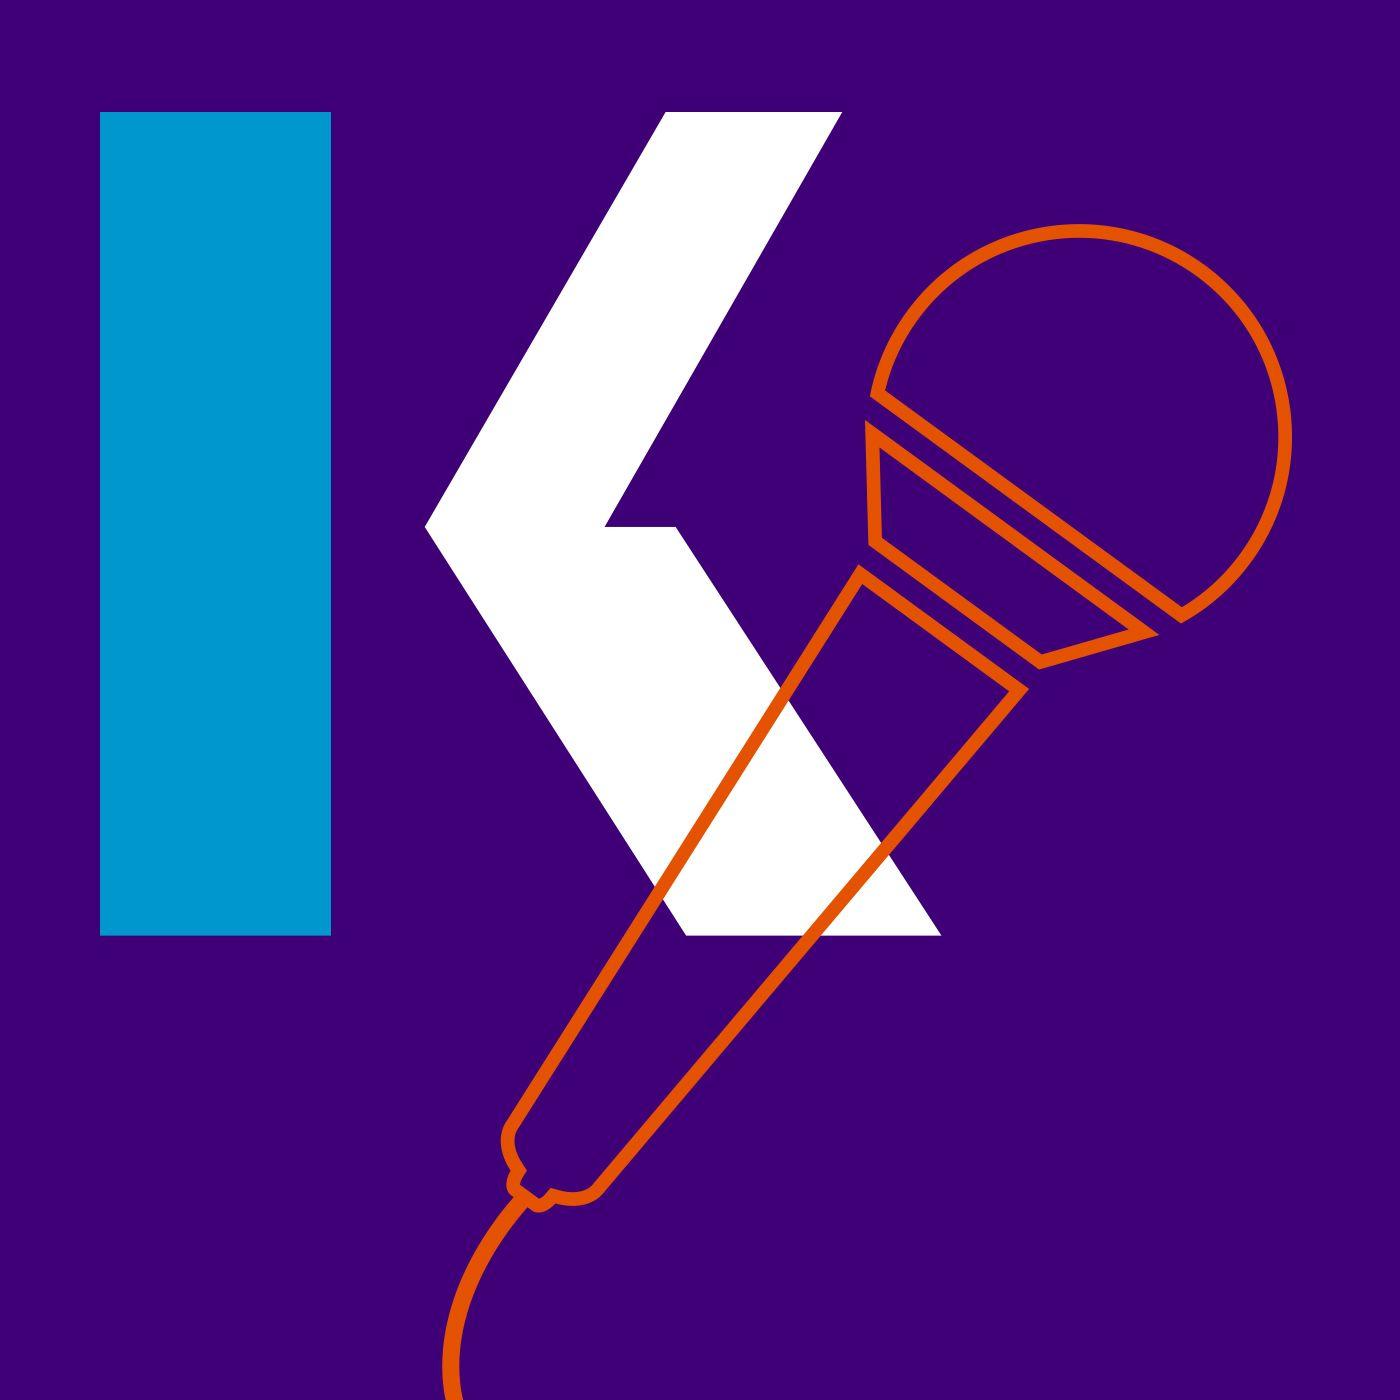 Kaplan's NCLEX Prepcast - Episode 34 - Overnight Shifts